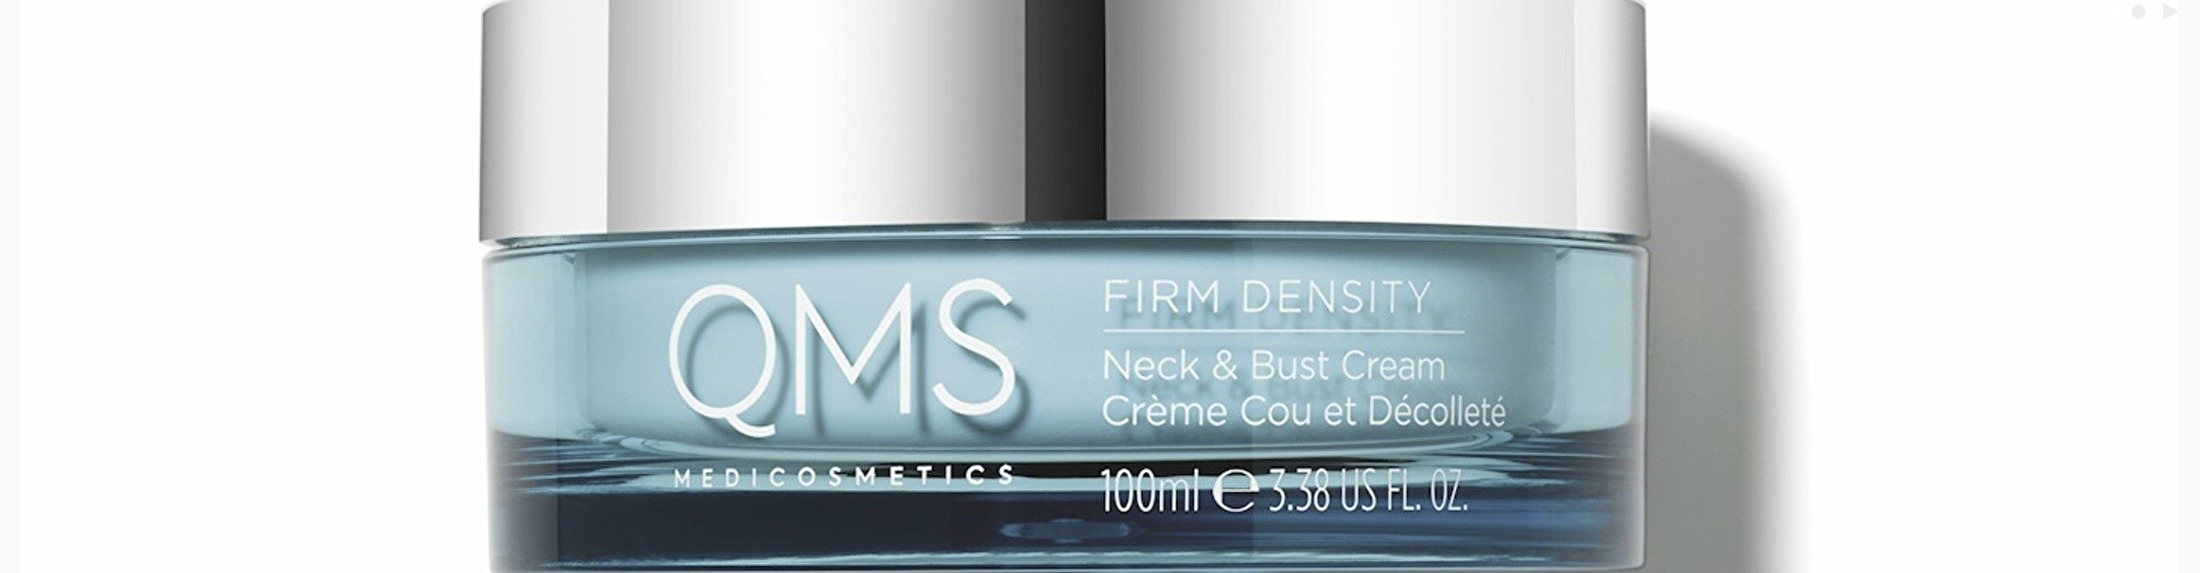 QMS Firm Density